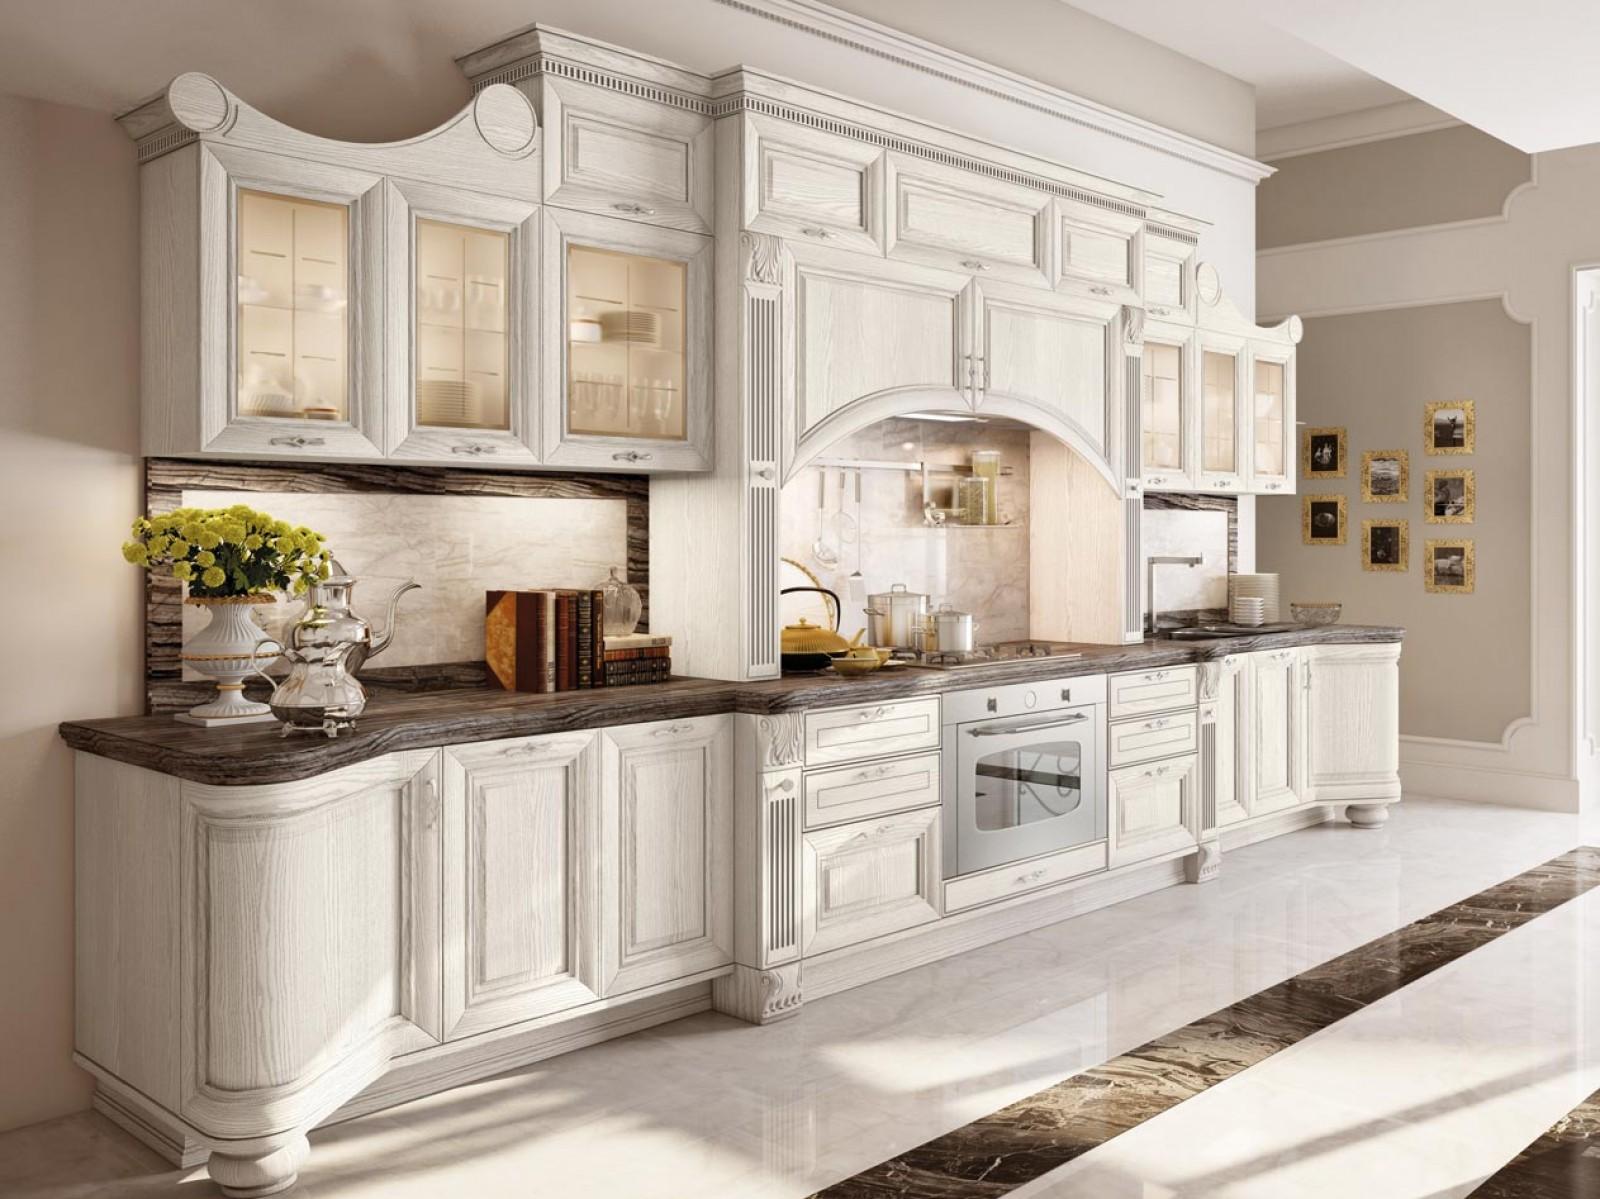 Proposte d 39 arredo cucine cucina pantheon di cucine lube - Prezzo cucina lube ...